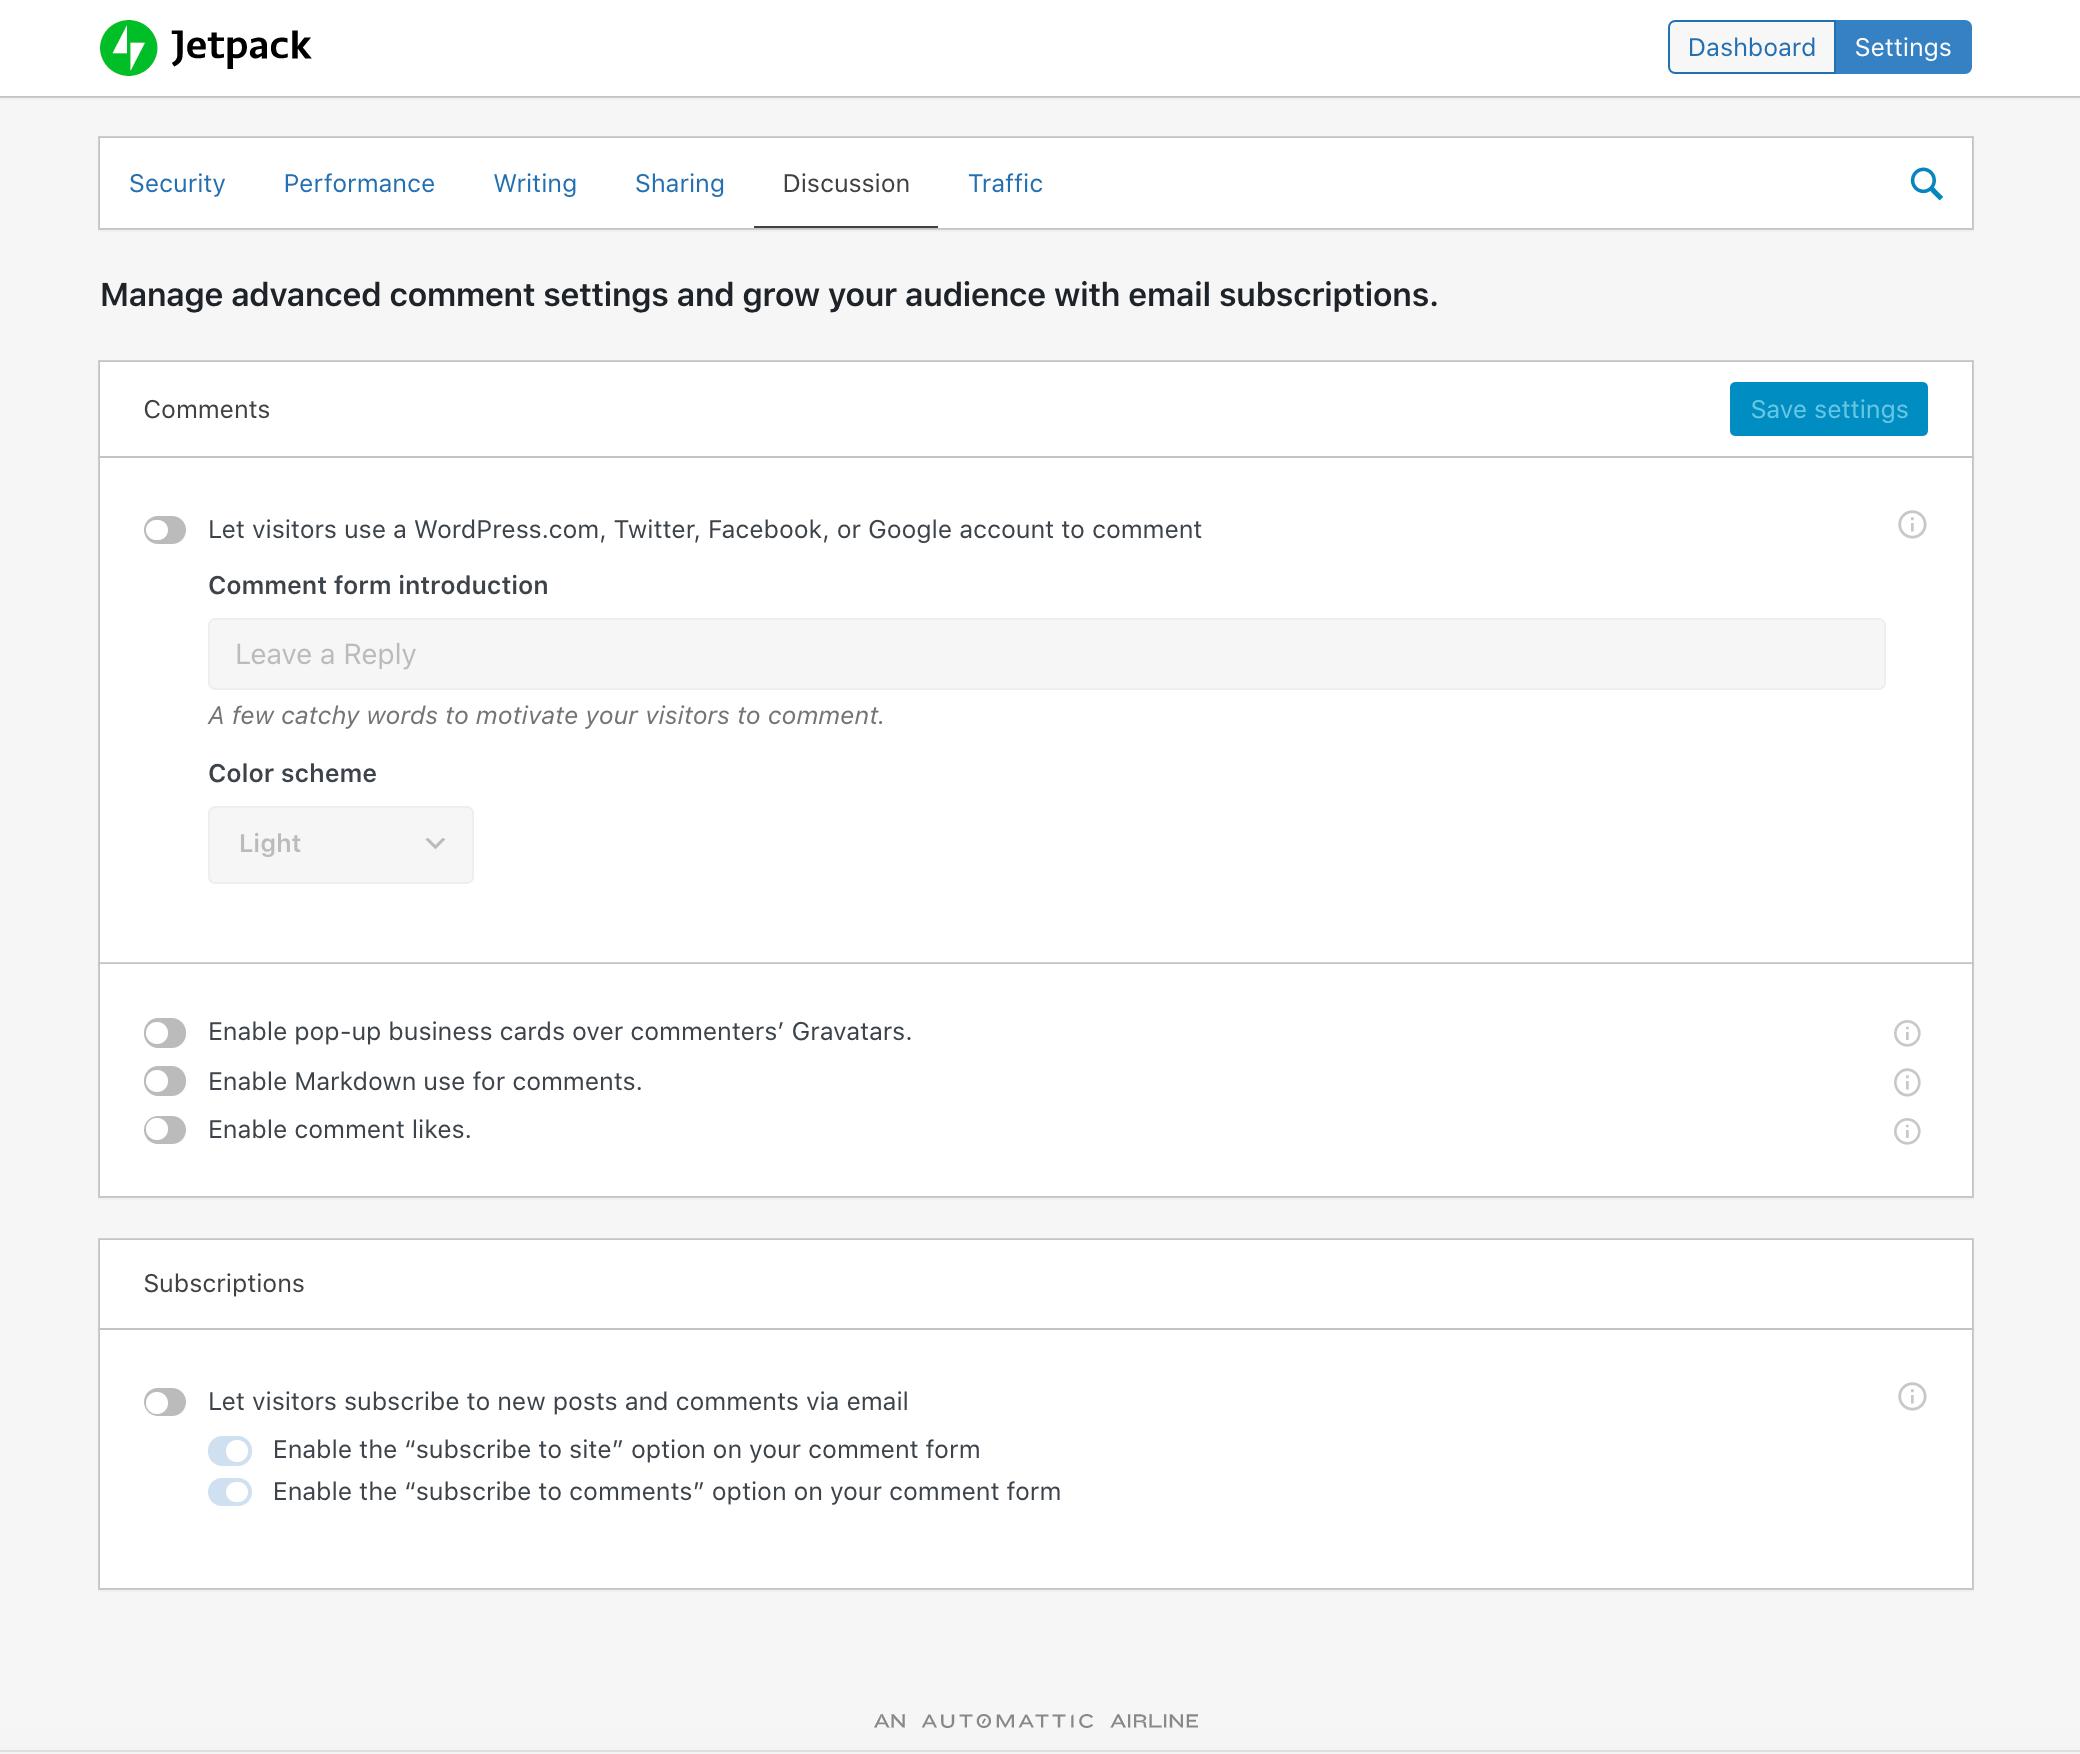 jetpack插件评论设置